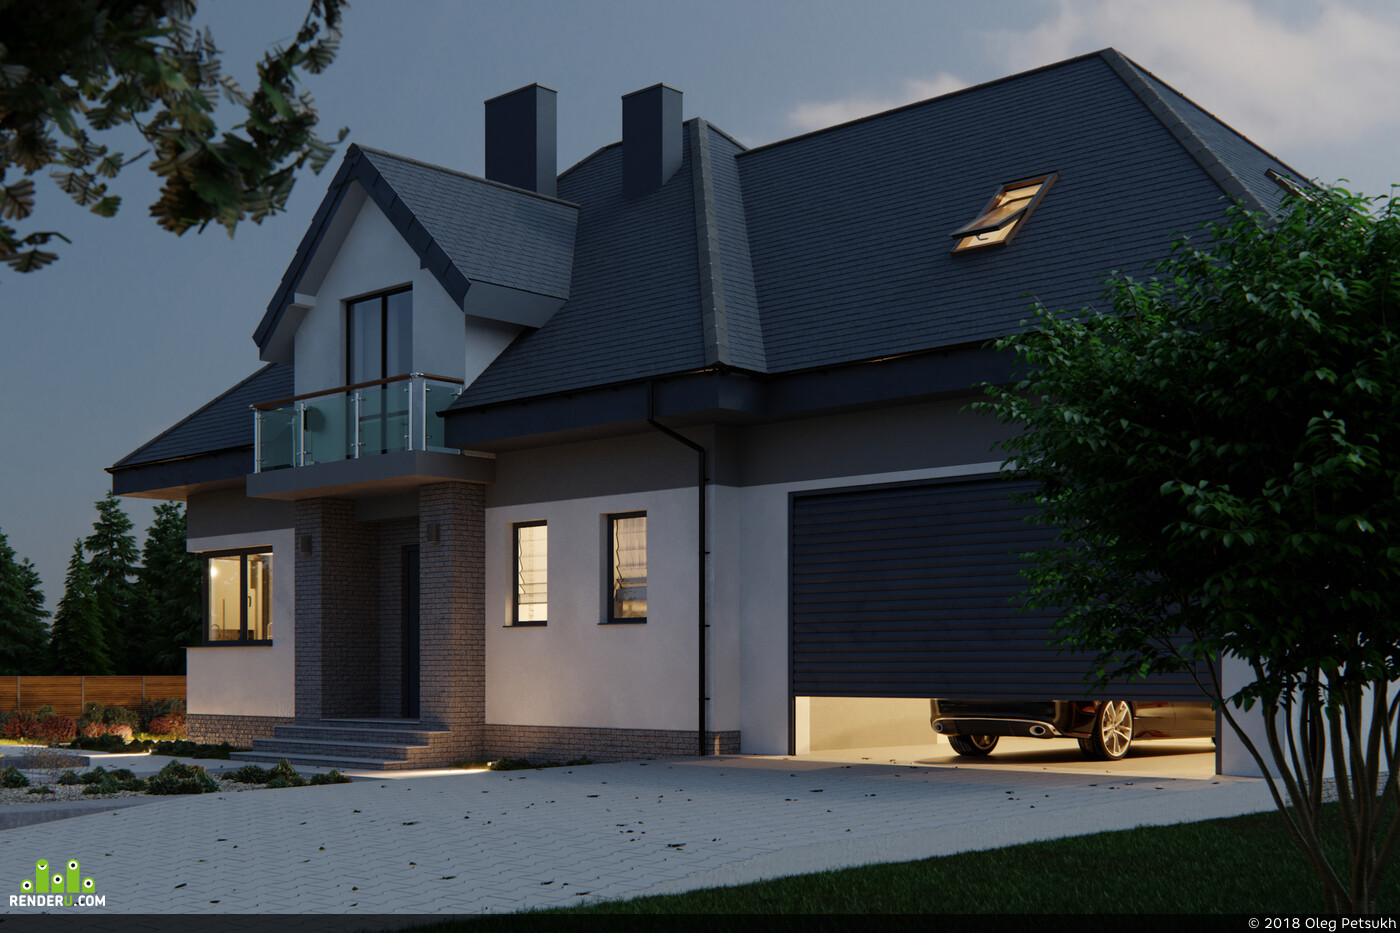 3д визуализация, коронарендер, фотошоп, фанарт, архитектурная визуализация, 3D архитектура